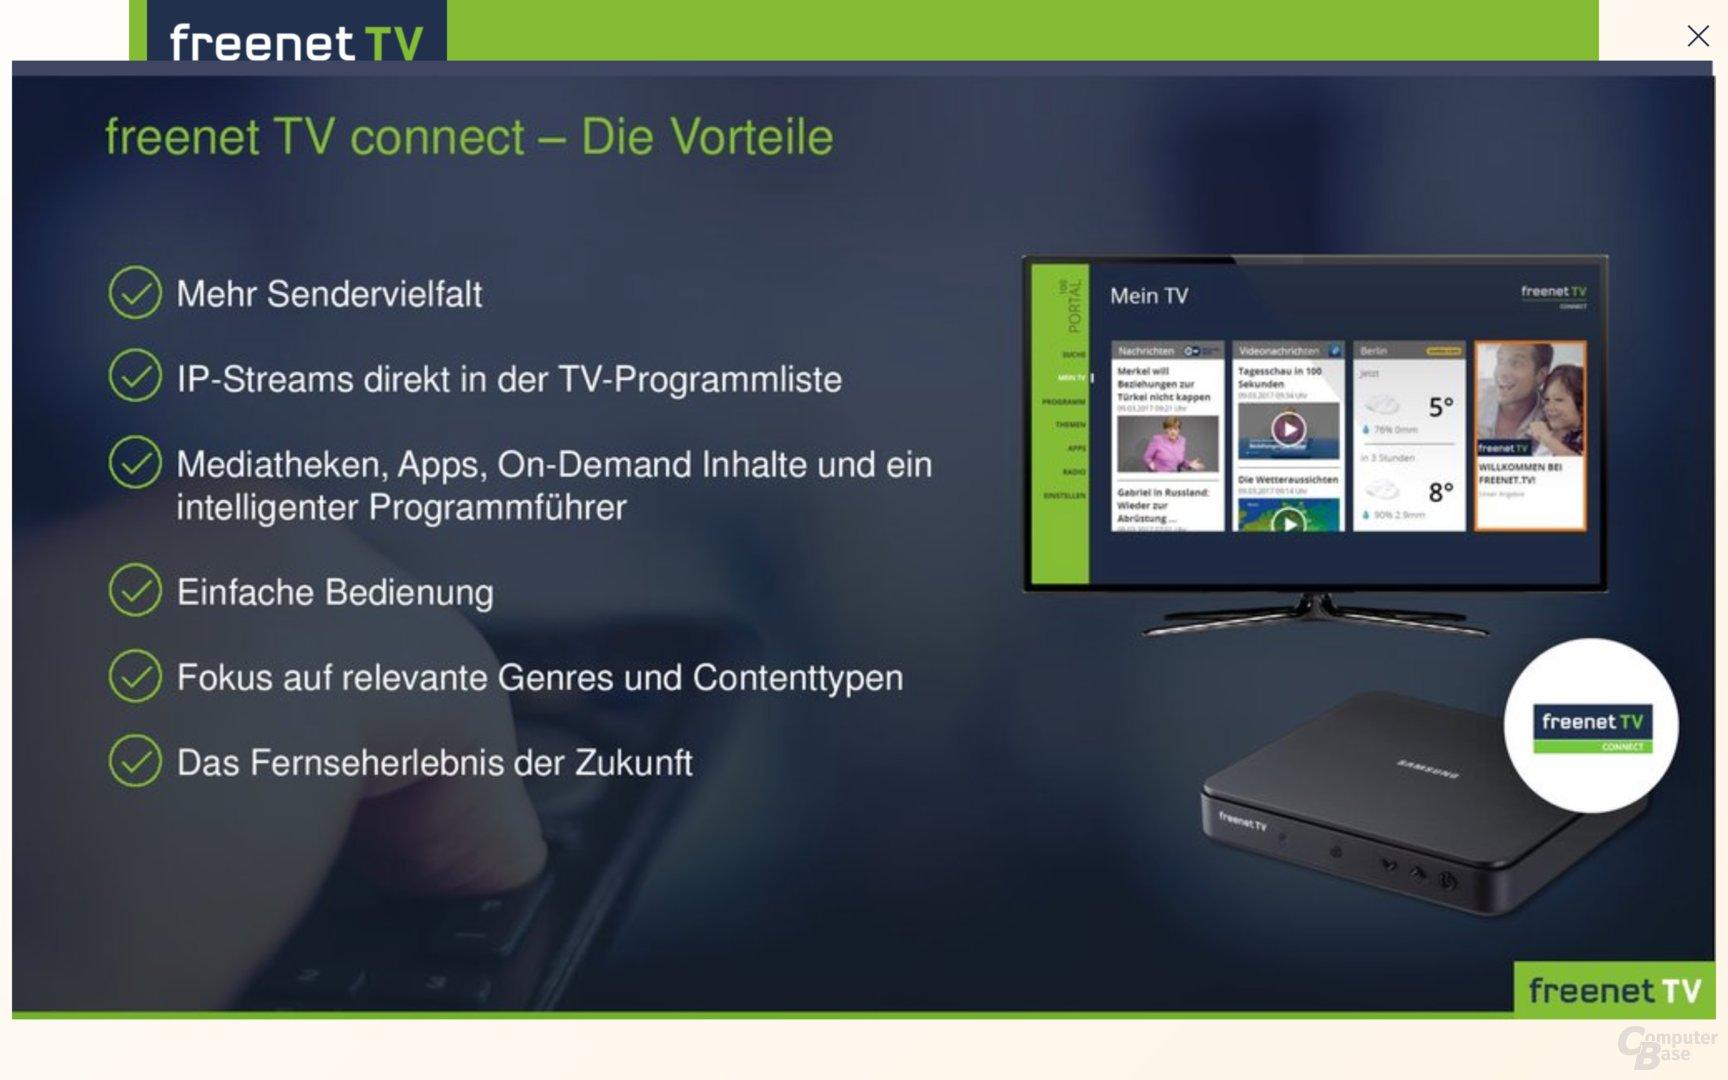 Freenet TV Connect integriert IP-Angebote